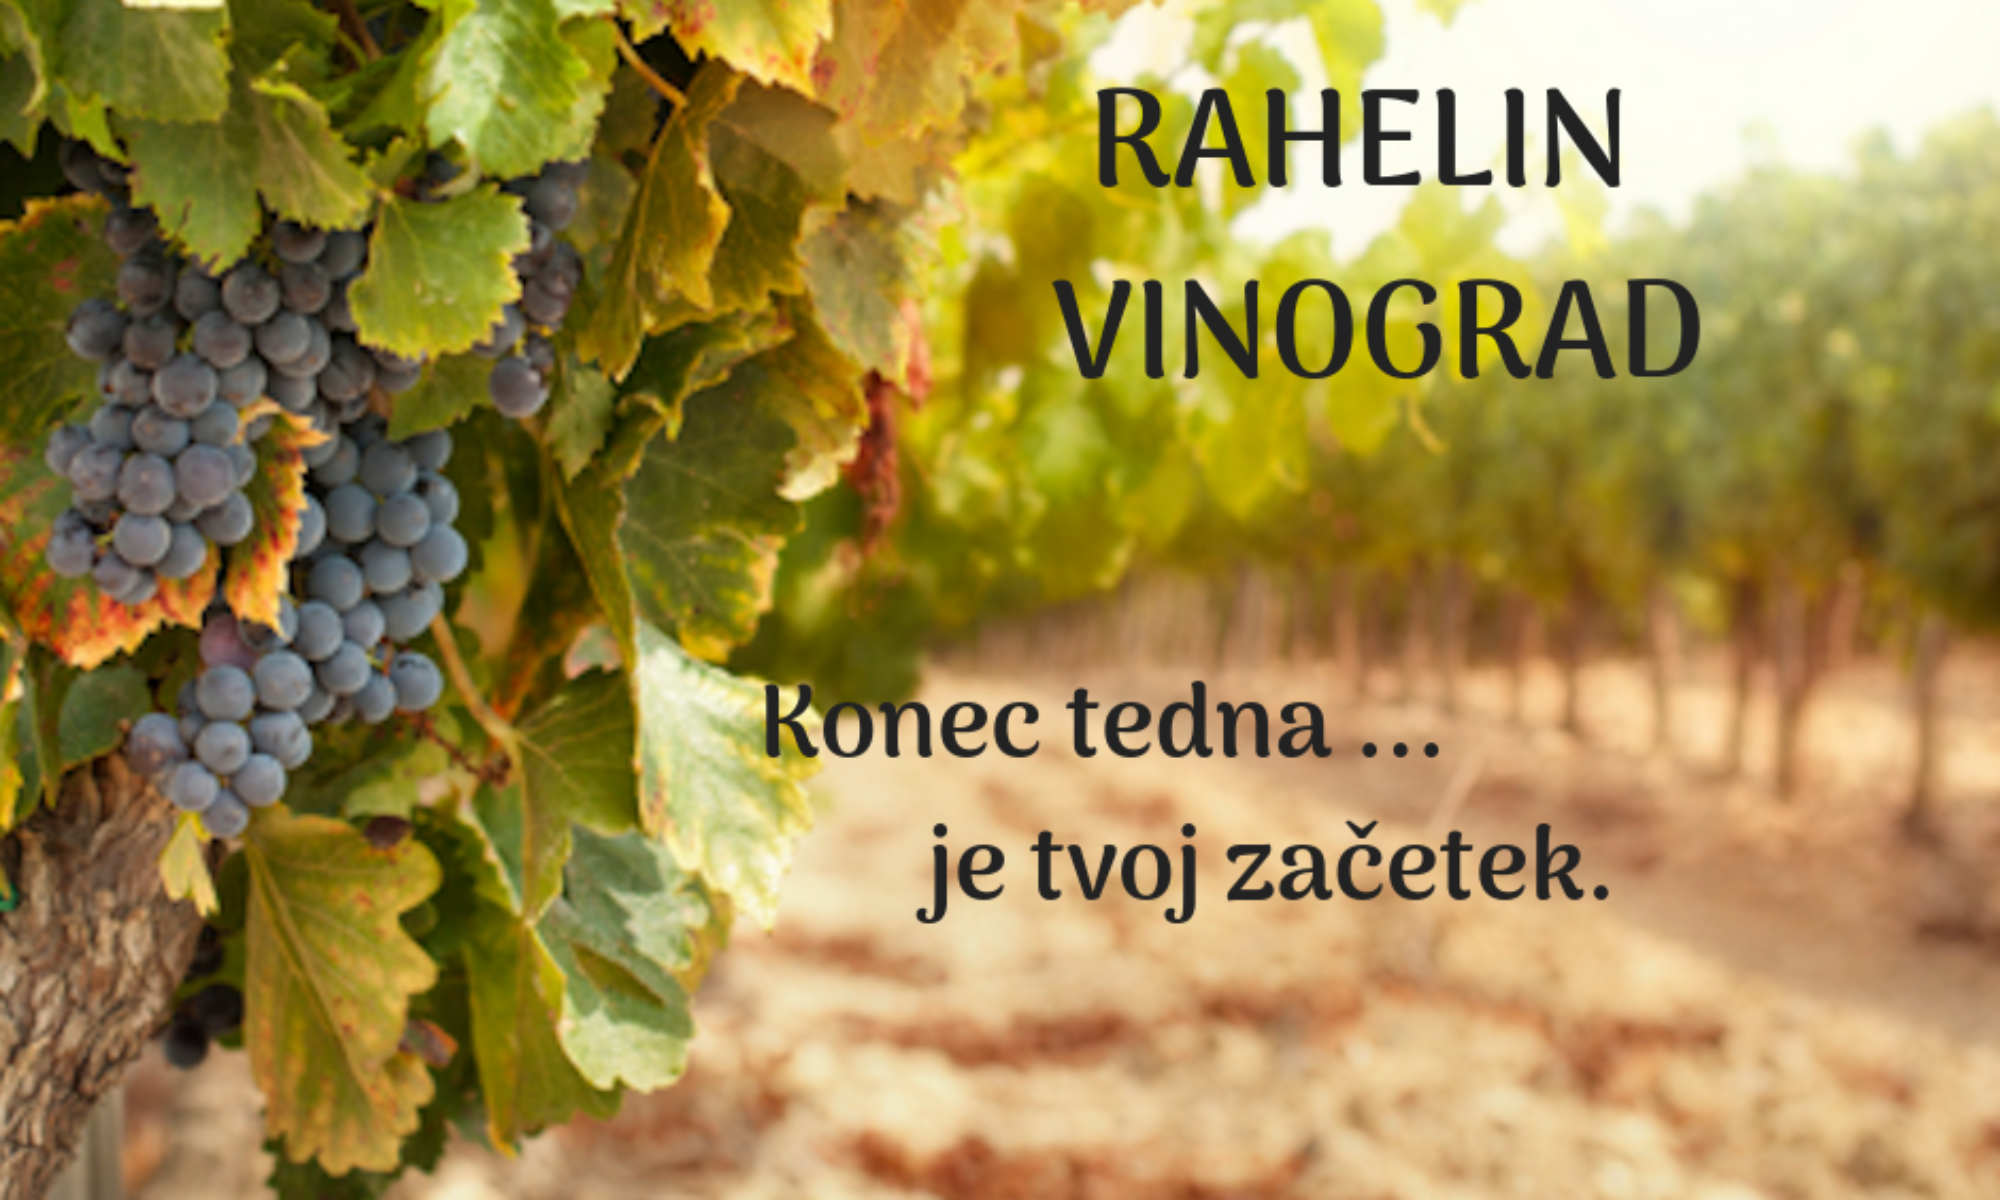 Rahelin vinograd